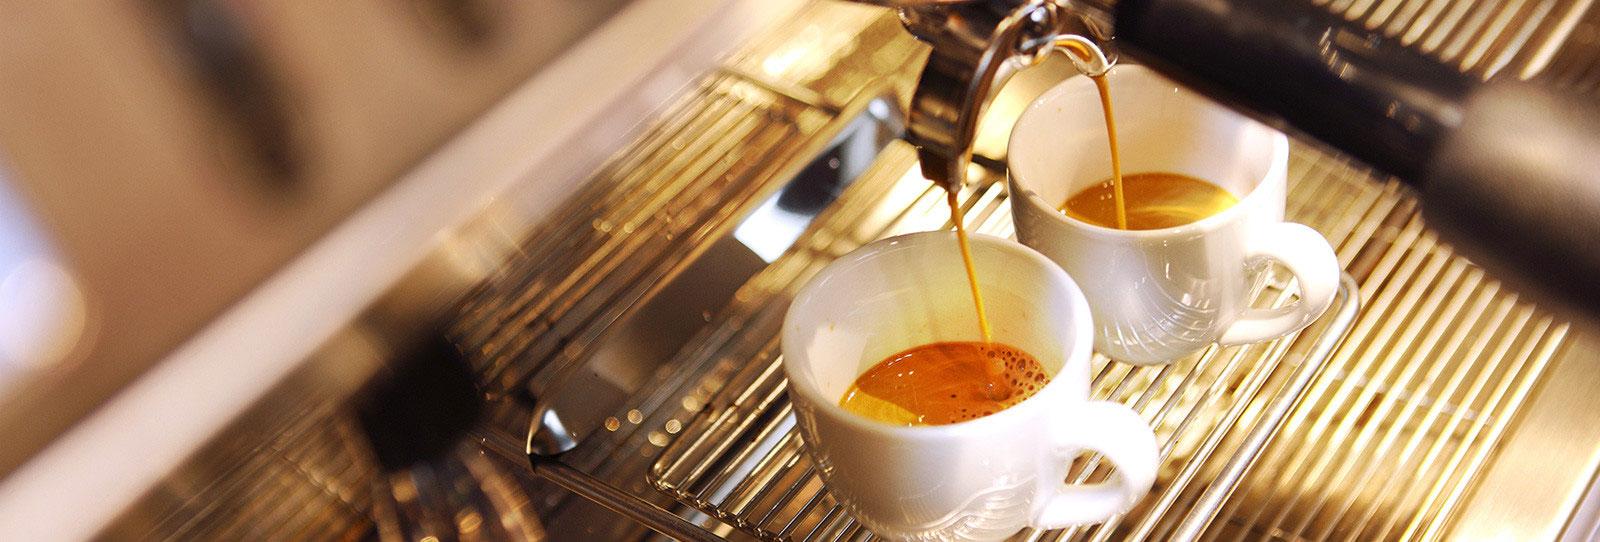 macchine per caffé